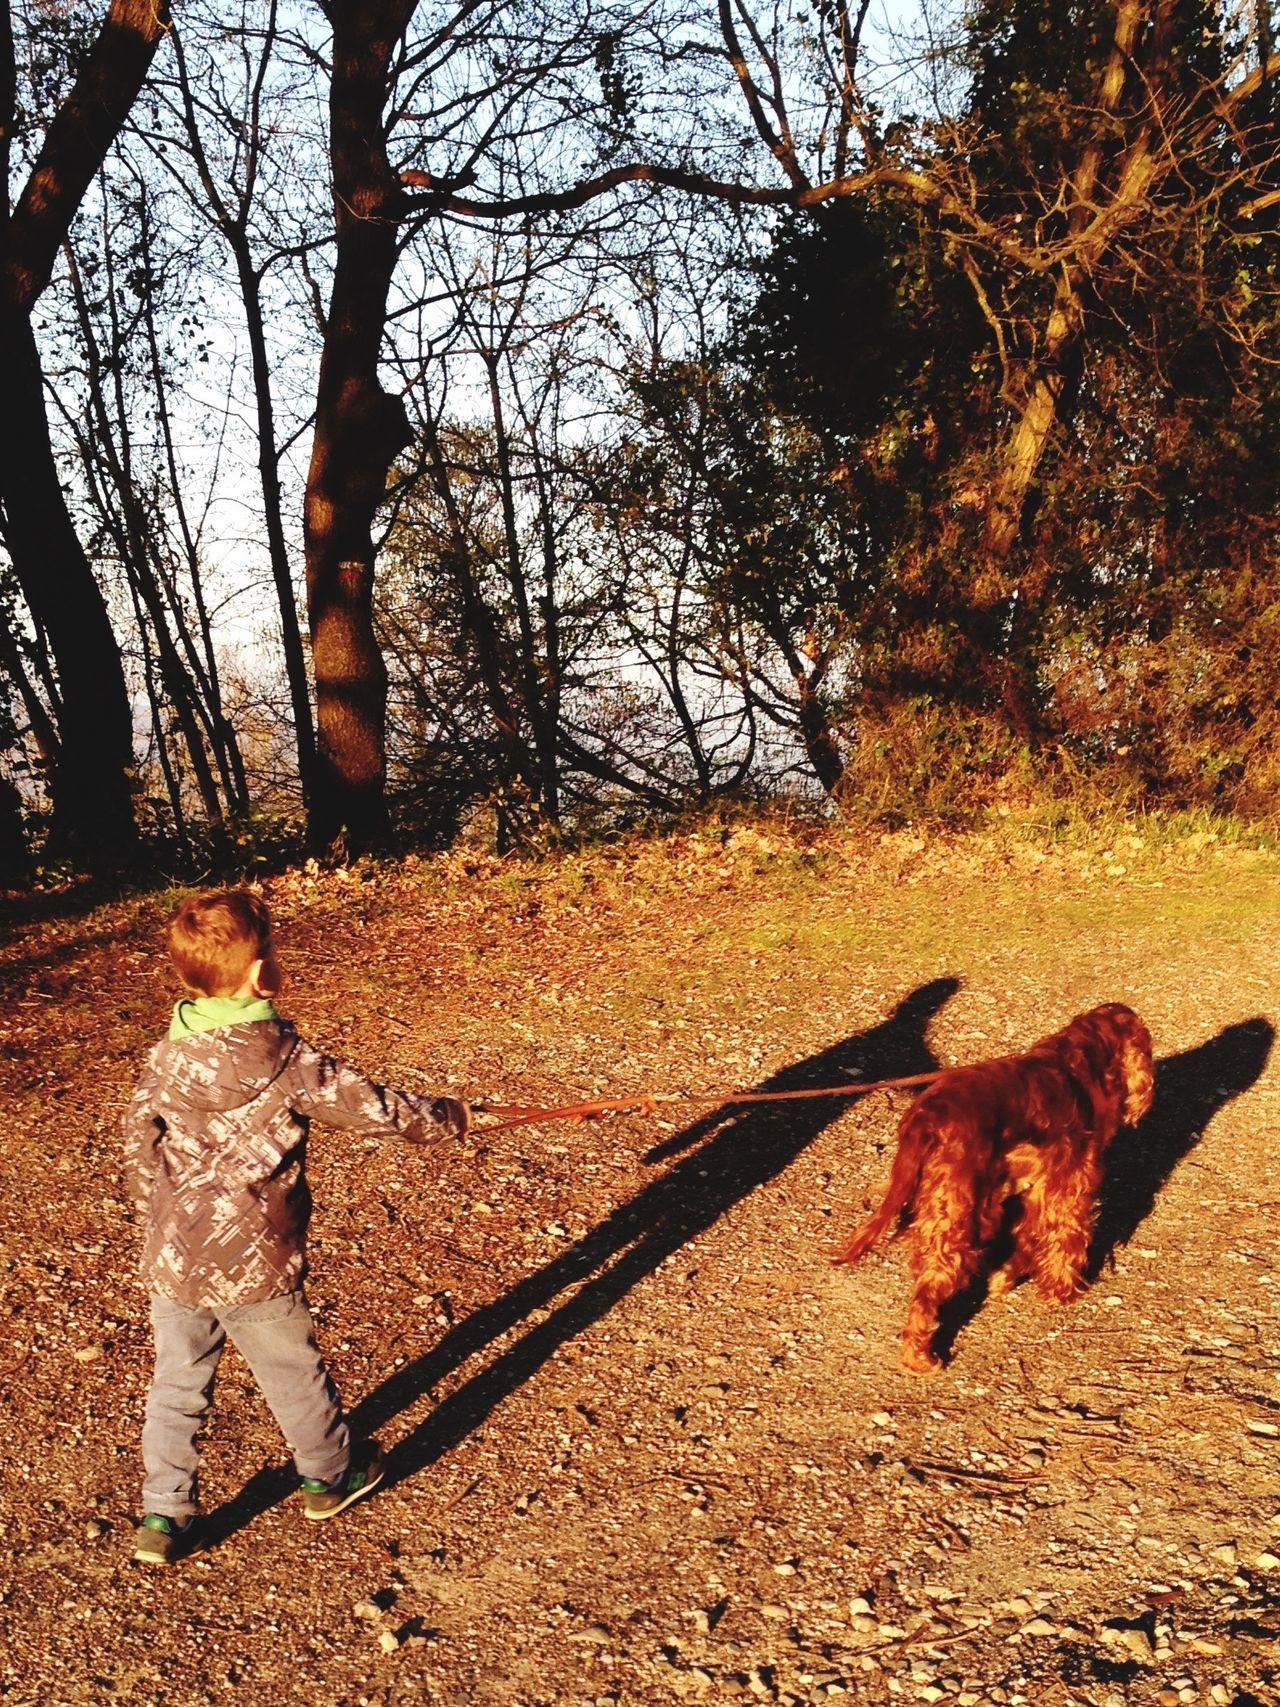 Kind Junge Hund GassiGehen Spaziergang Outdoor Photography EyeEm Best Shots EyeEm Nature Lover Dog Boy EyeEm Family❤ Taken By Me